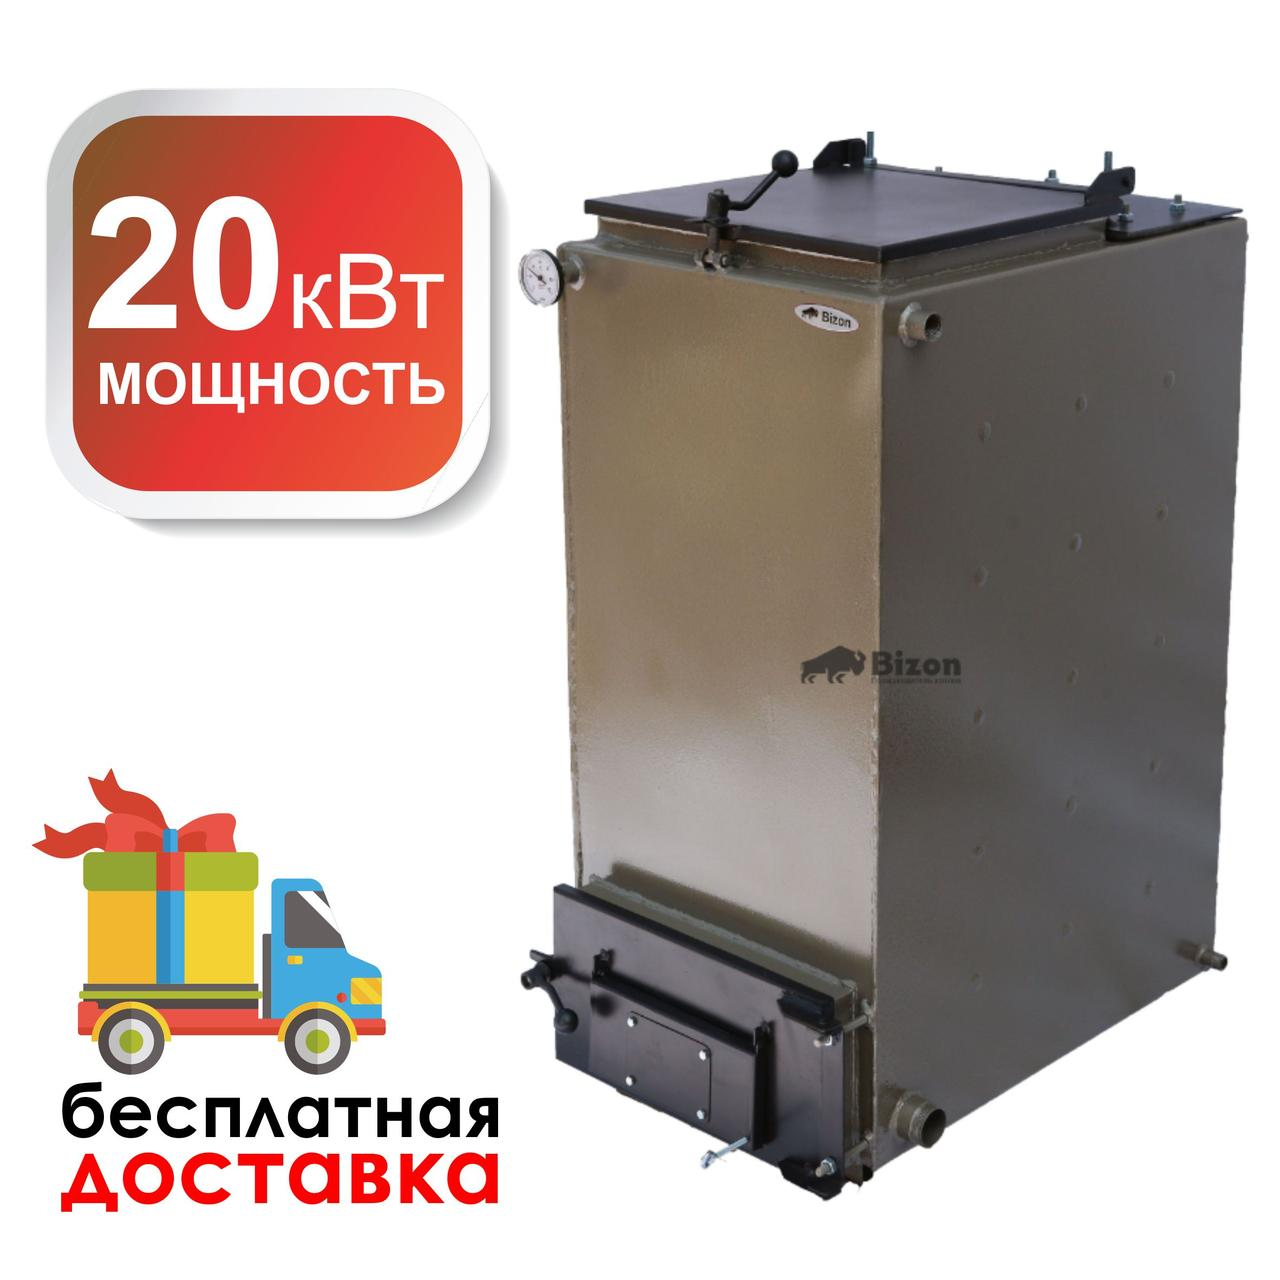 Котел длительного горения Холмова Бизон FS 20 кВт